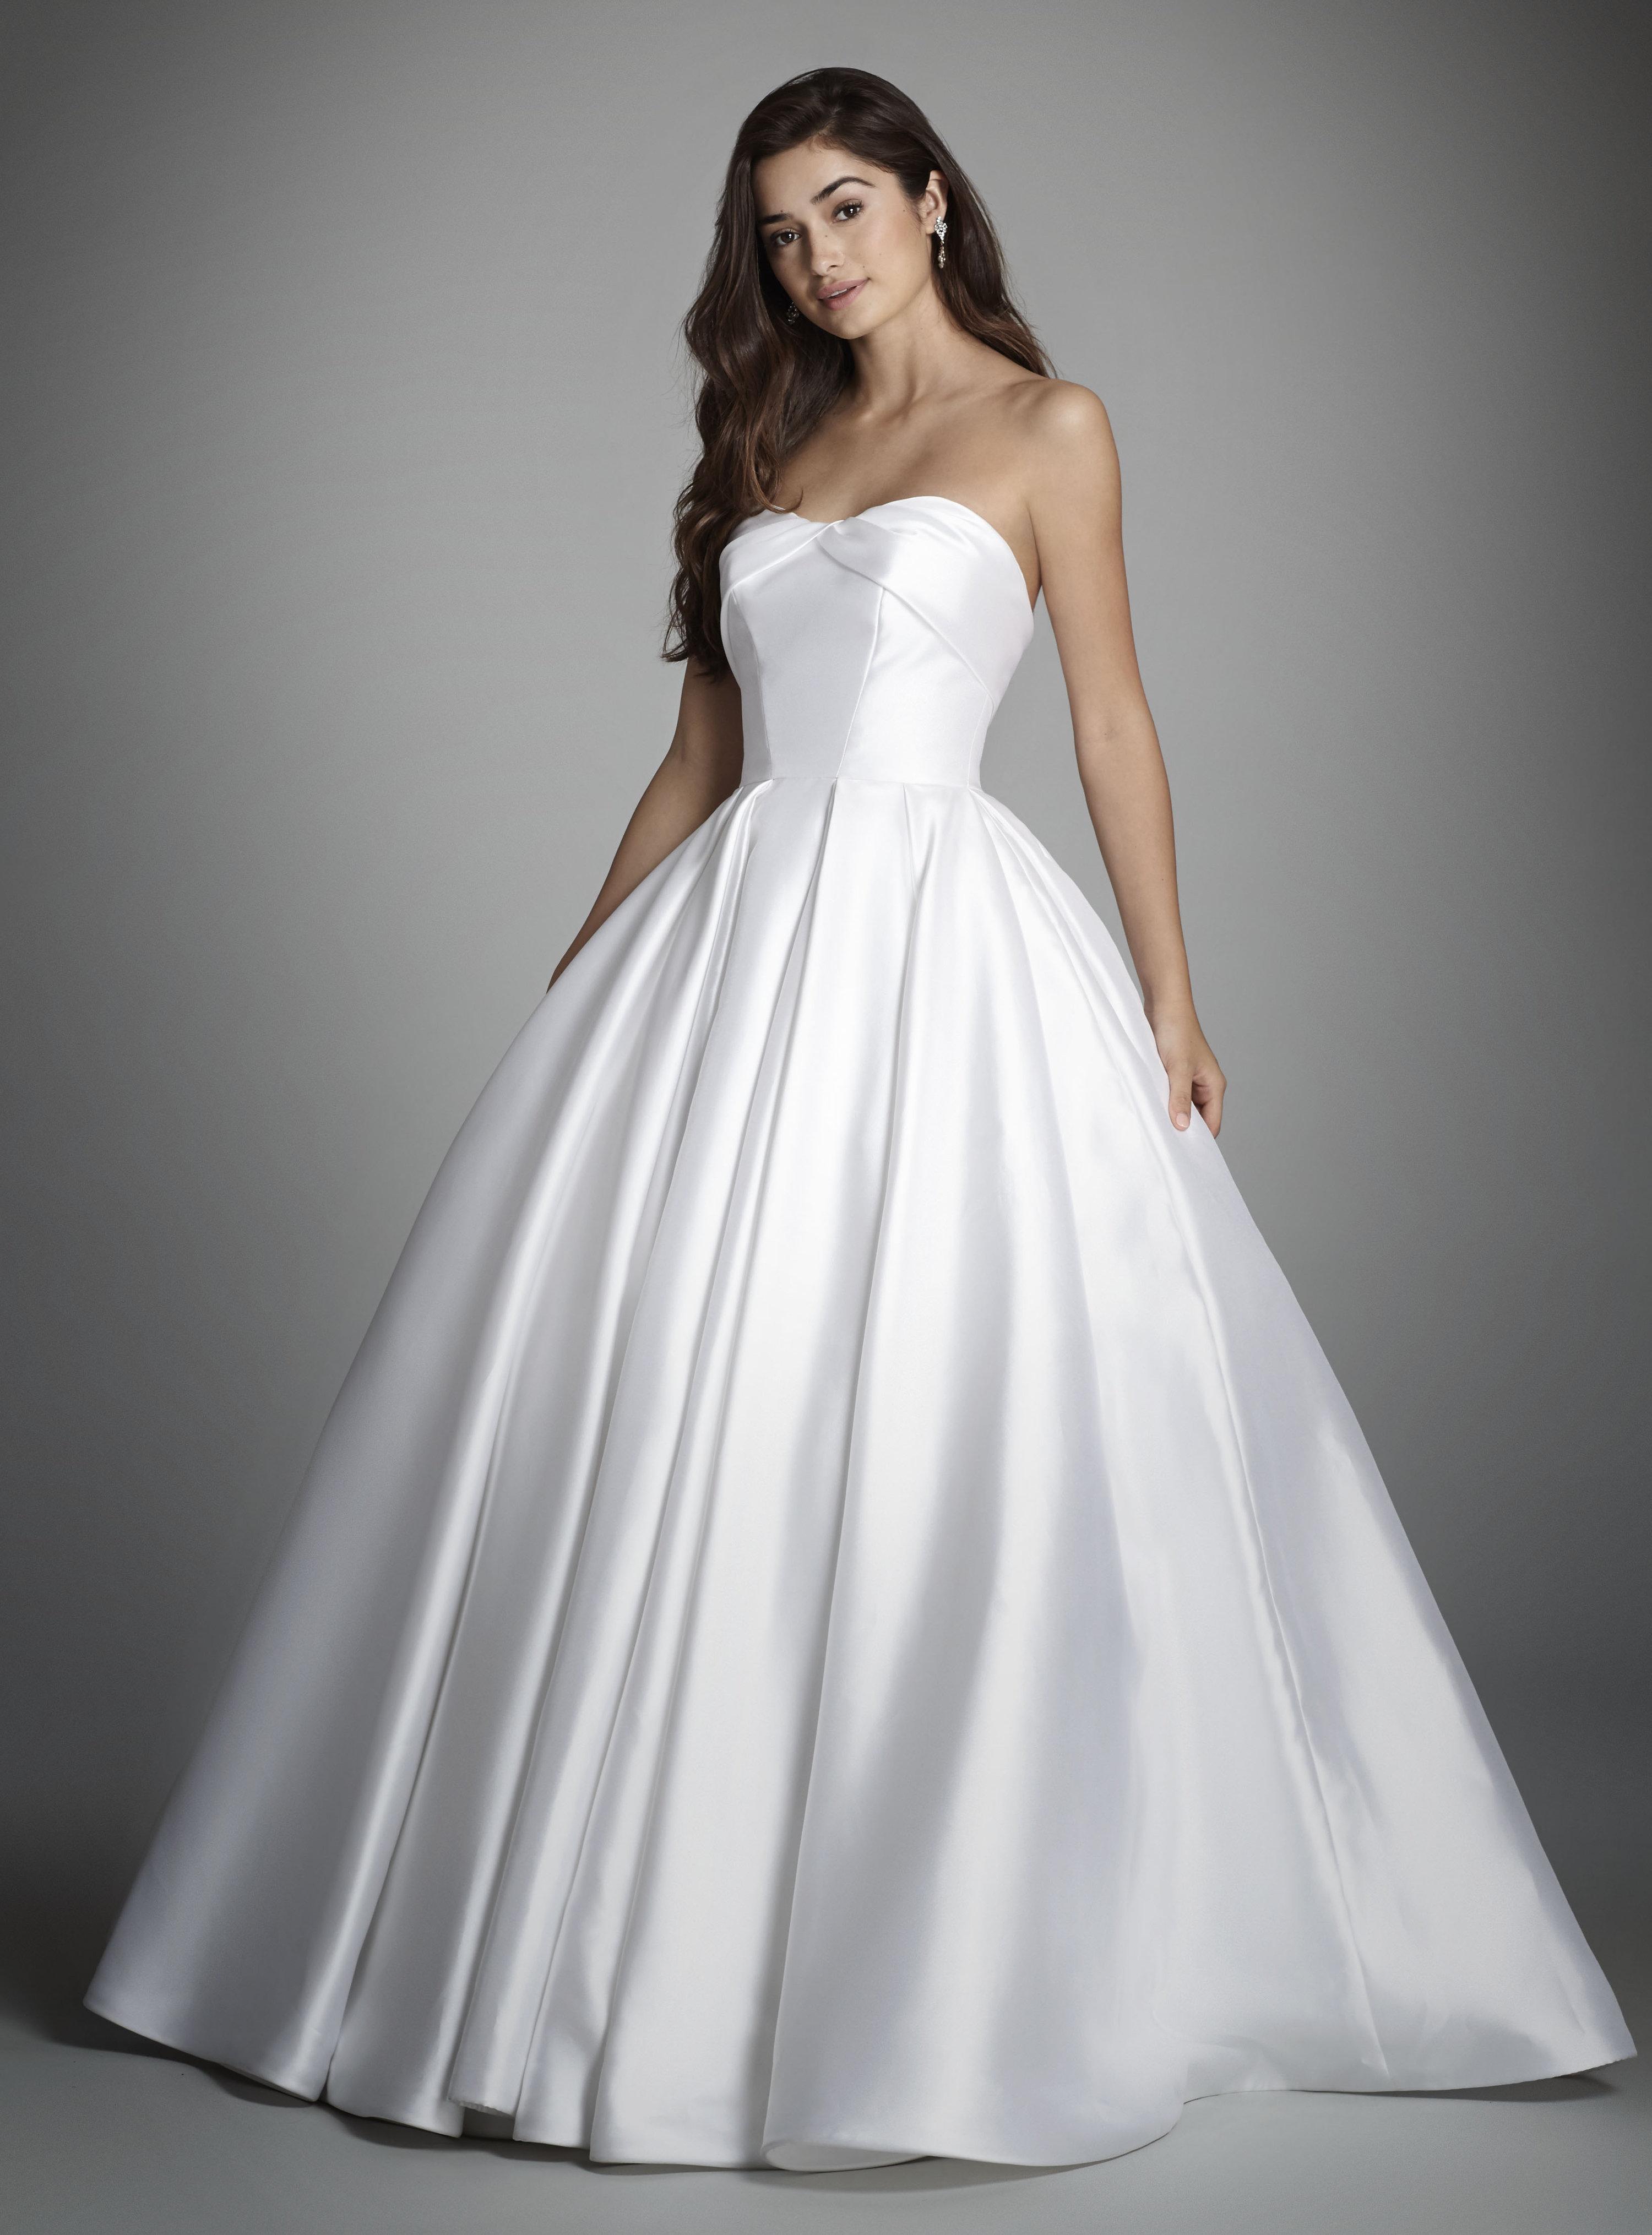 foto Alvina Valenta Spring 2014 Bridal Gown Collection – Part 4